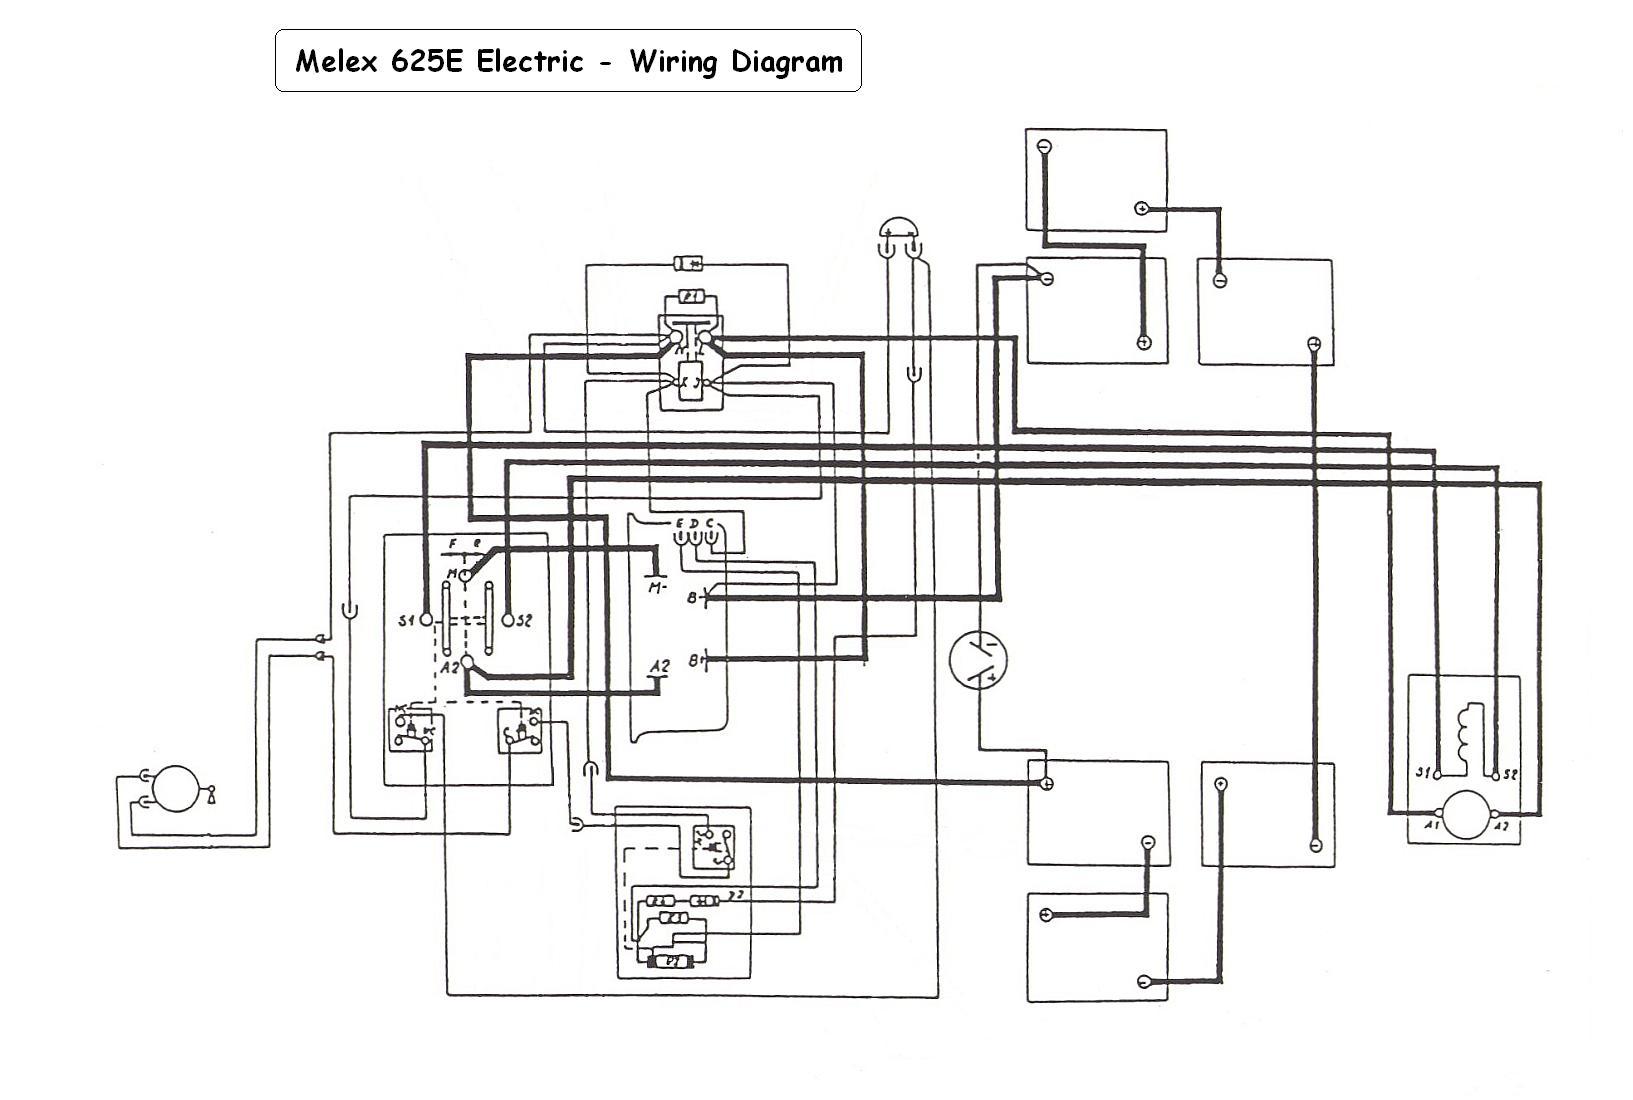 Harley Davidson Electric Golf Cart Wiring Diagram Msd 6al 6420 Wiring Diagram Gm Bege Wiring Diagram